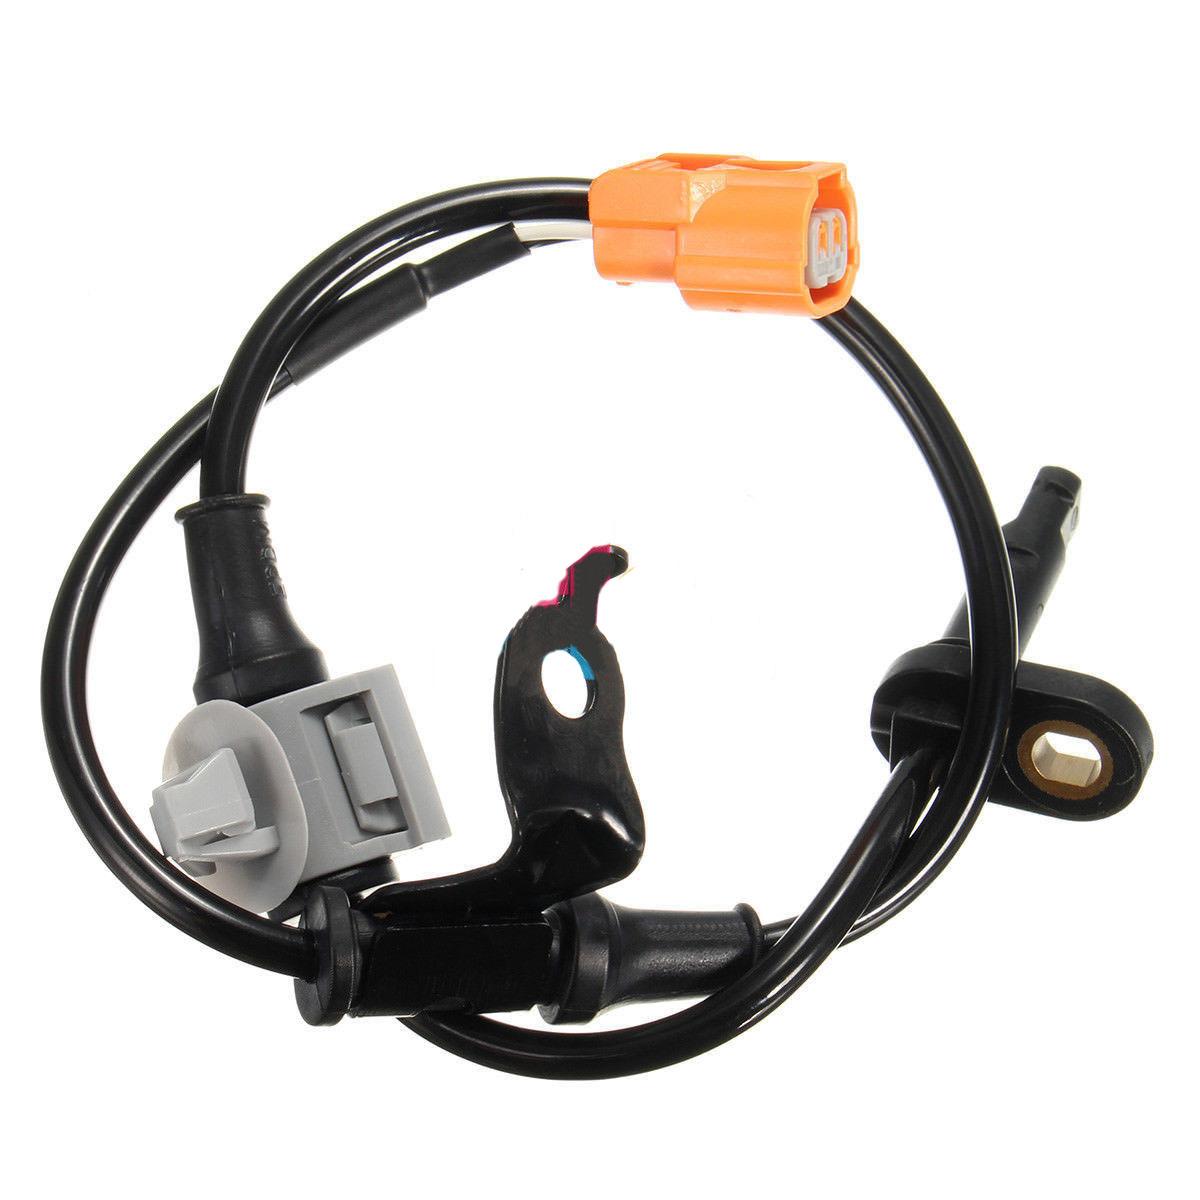 57470-SEA-013 ABS Speed Sensor Fit For Honda Accord Acura